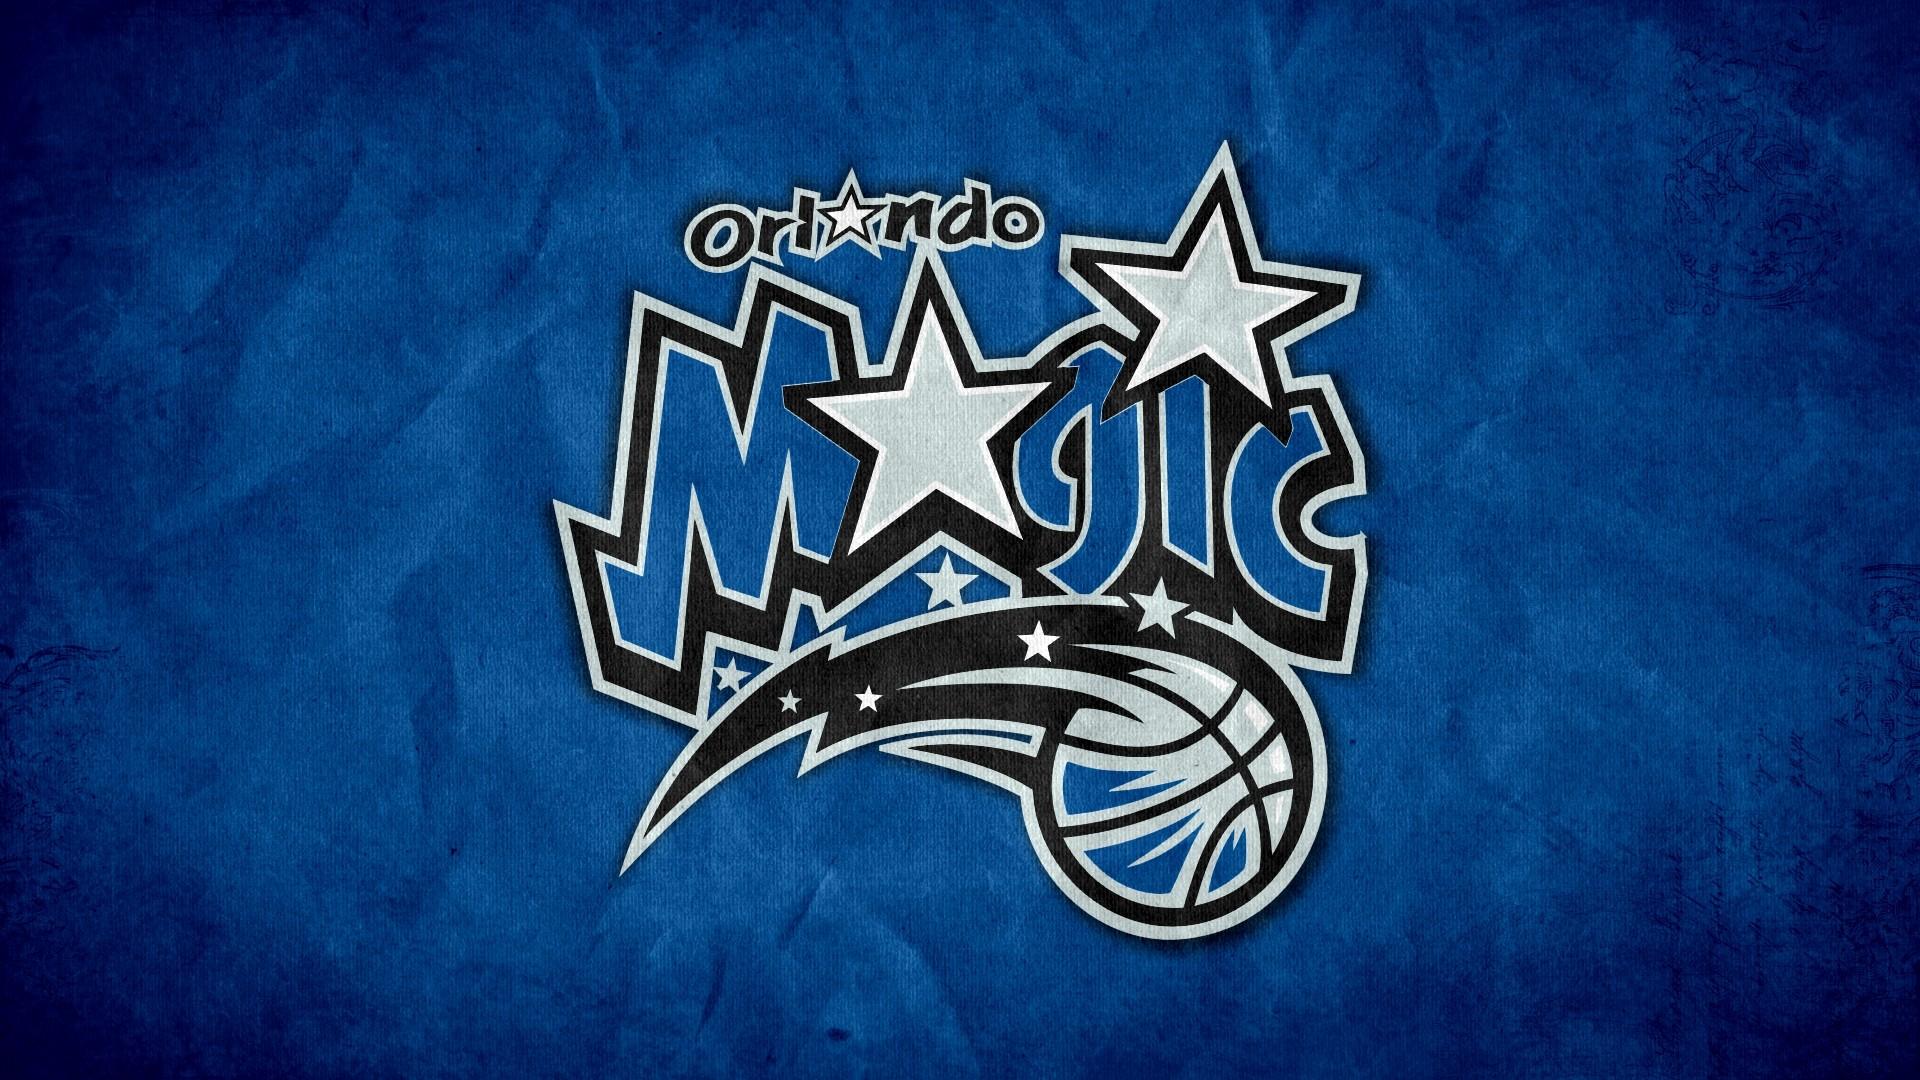 Wallpaper Hd Colors Orlando Magic Nba Basketball 13 Wallpaper 1920x1080